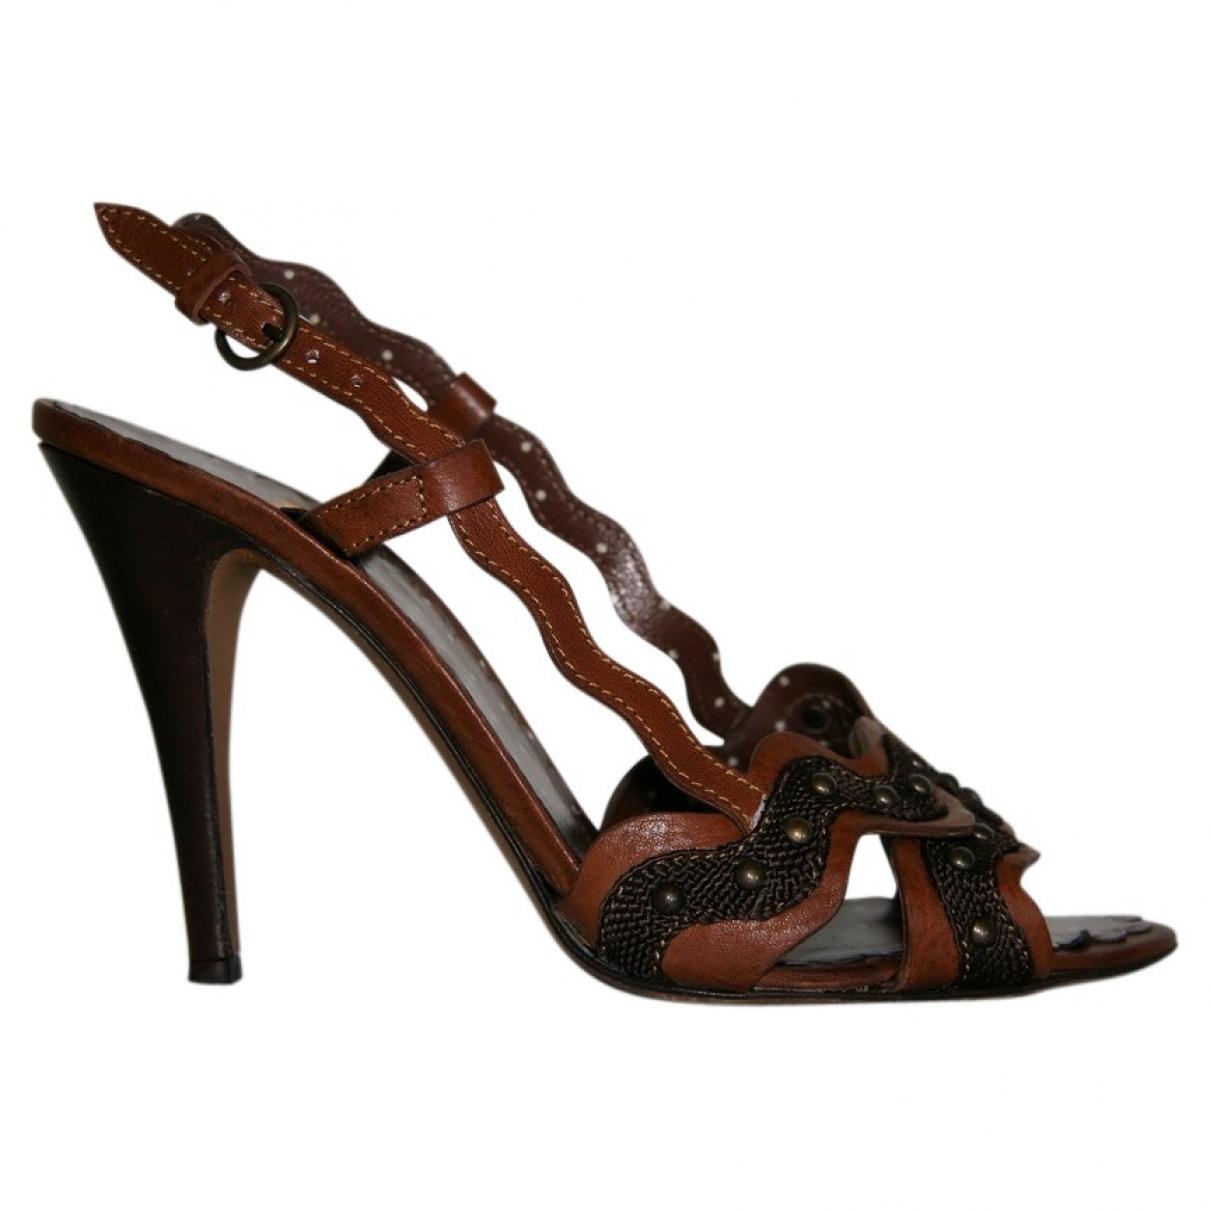 Sandalias romanas de Cuero Moschino Cheap And Chic